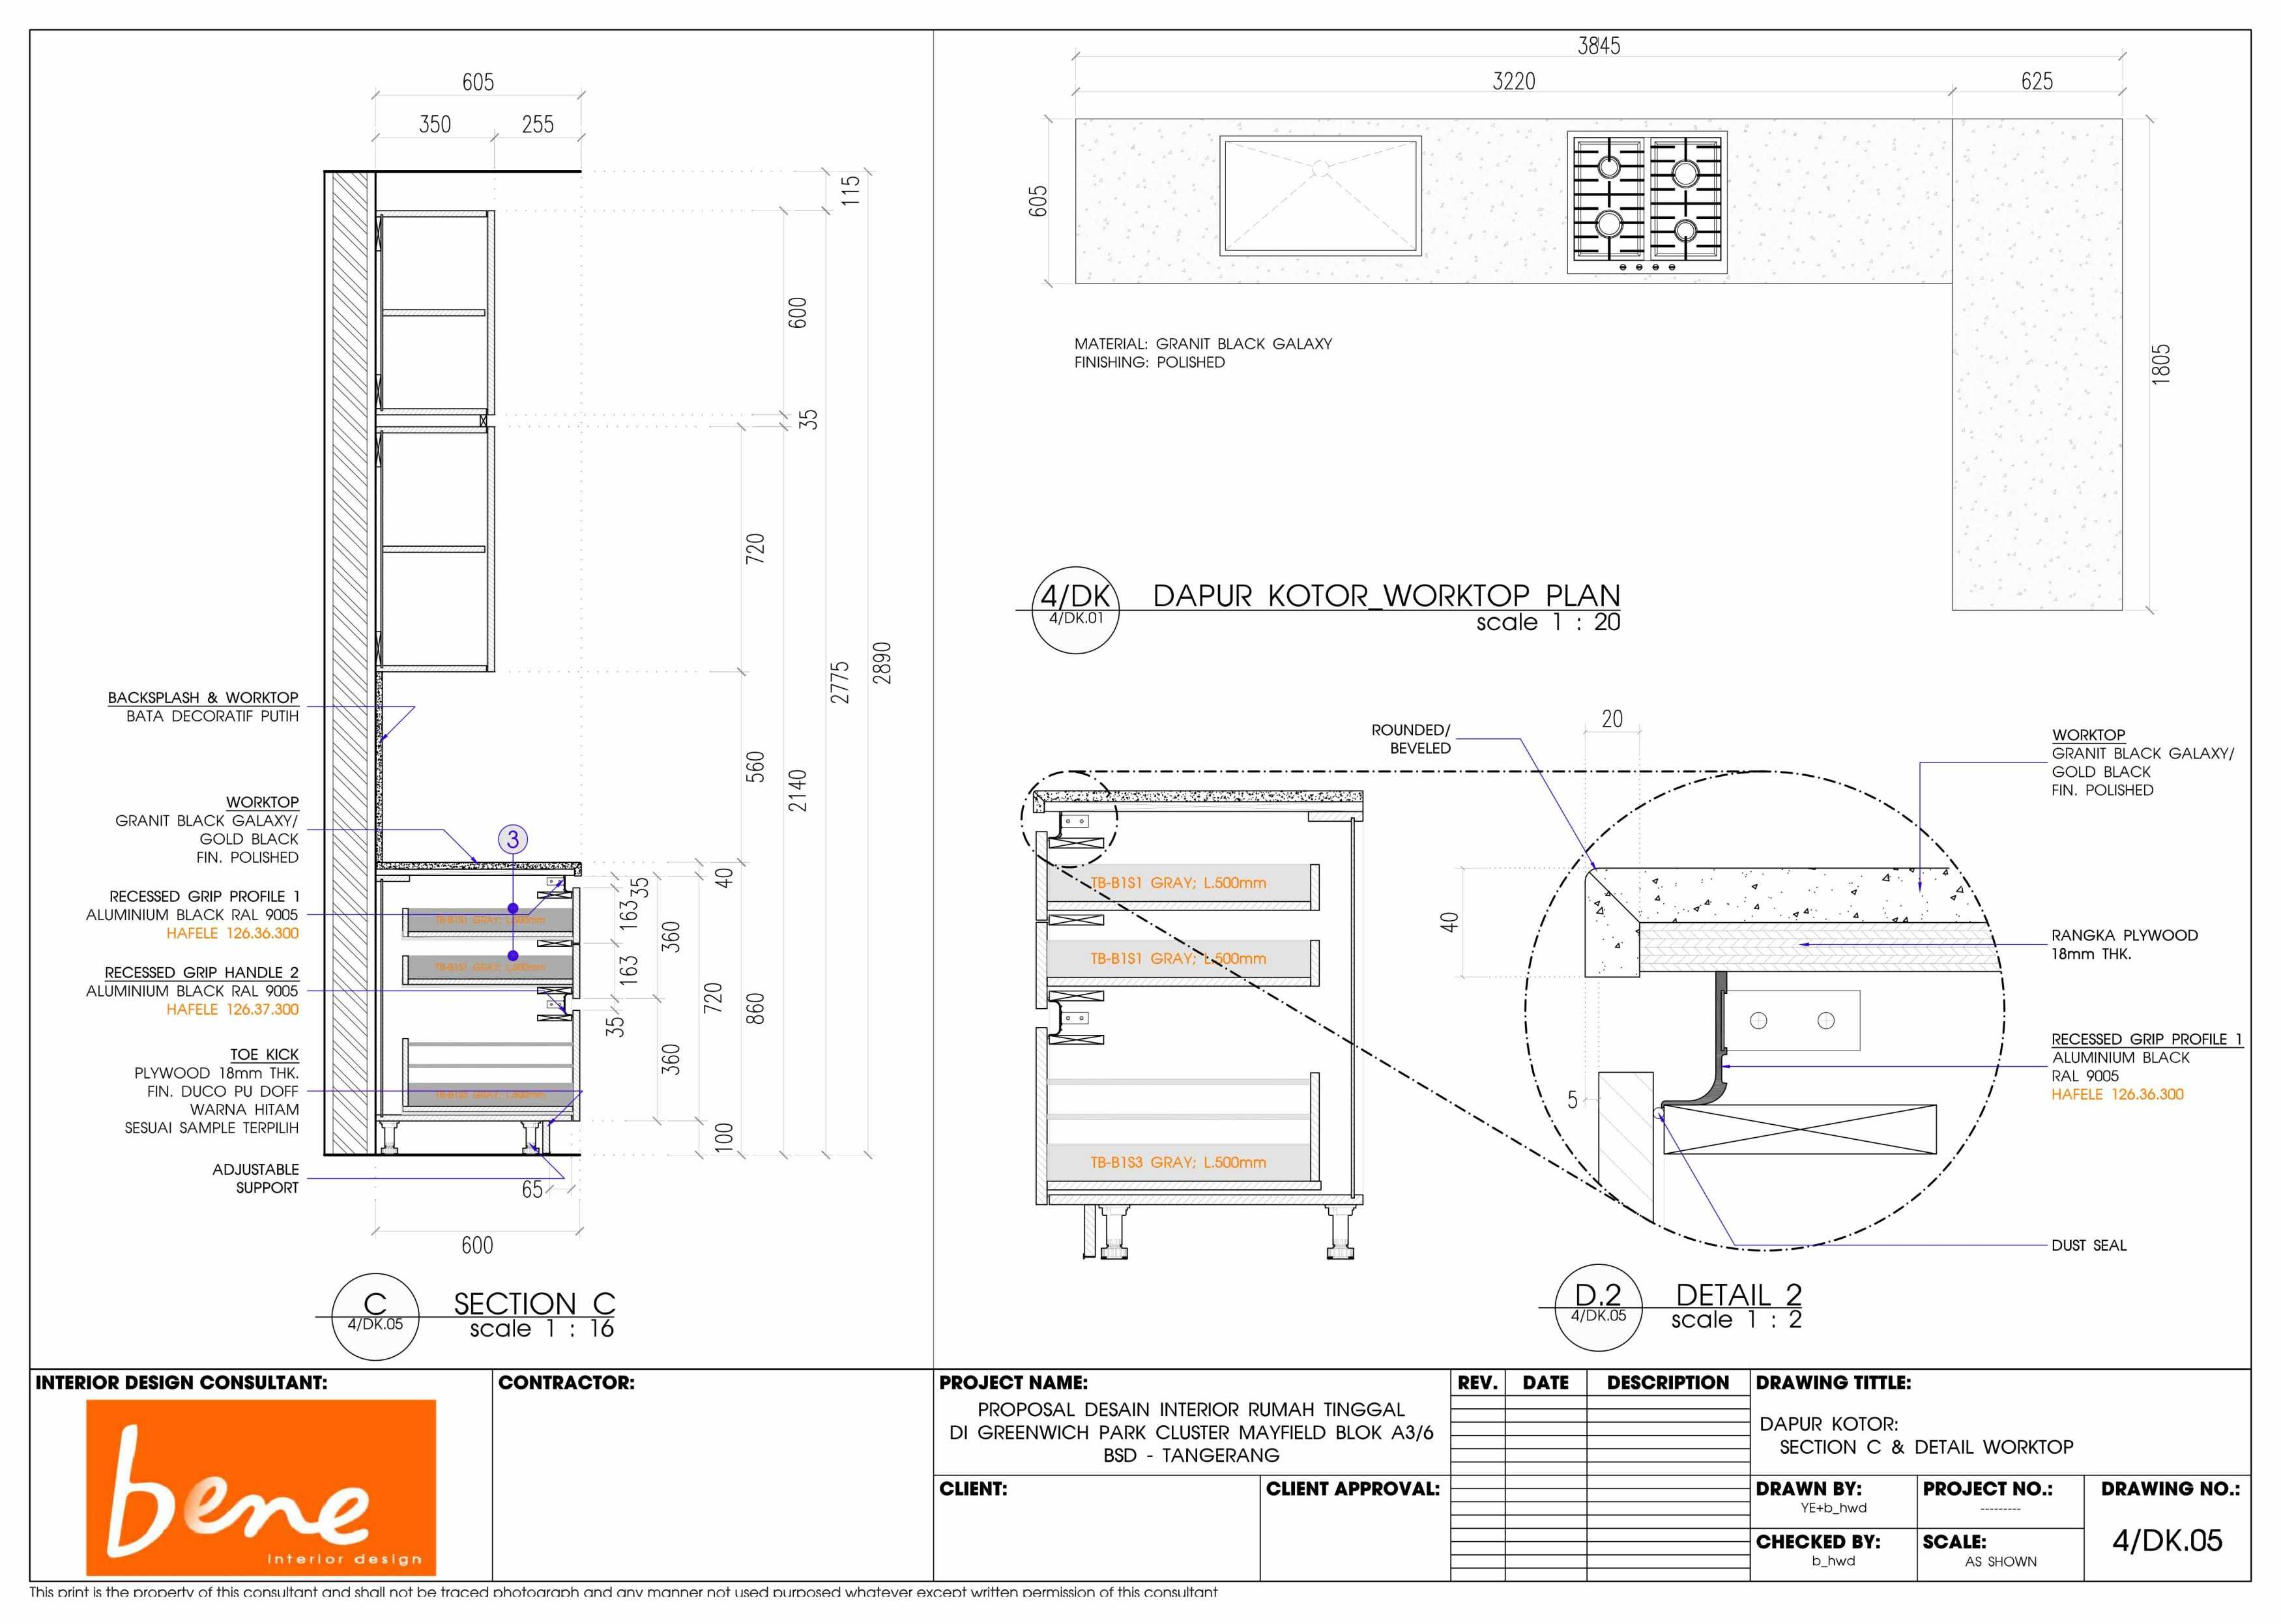 Bene Kitchen Desain Bsd Bsd Plan Modern  12818